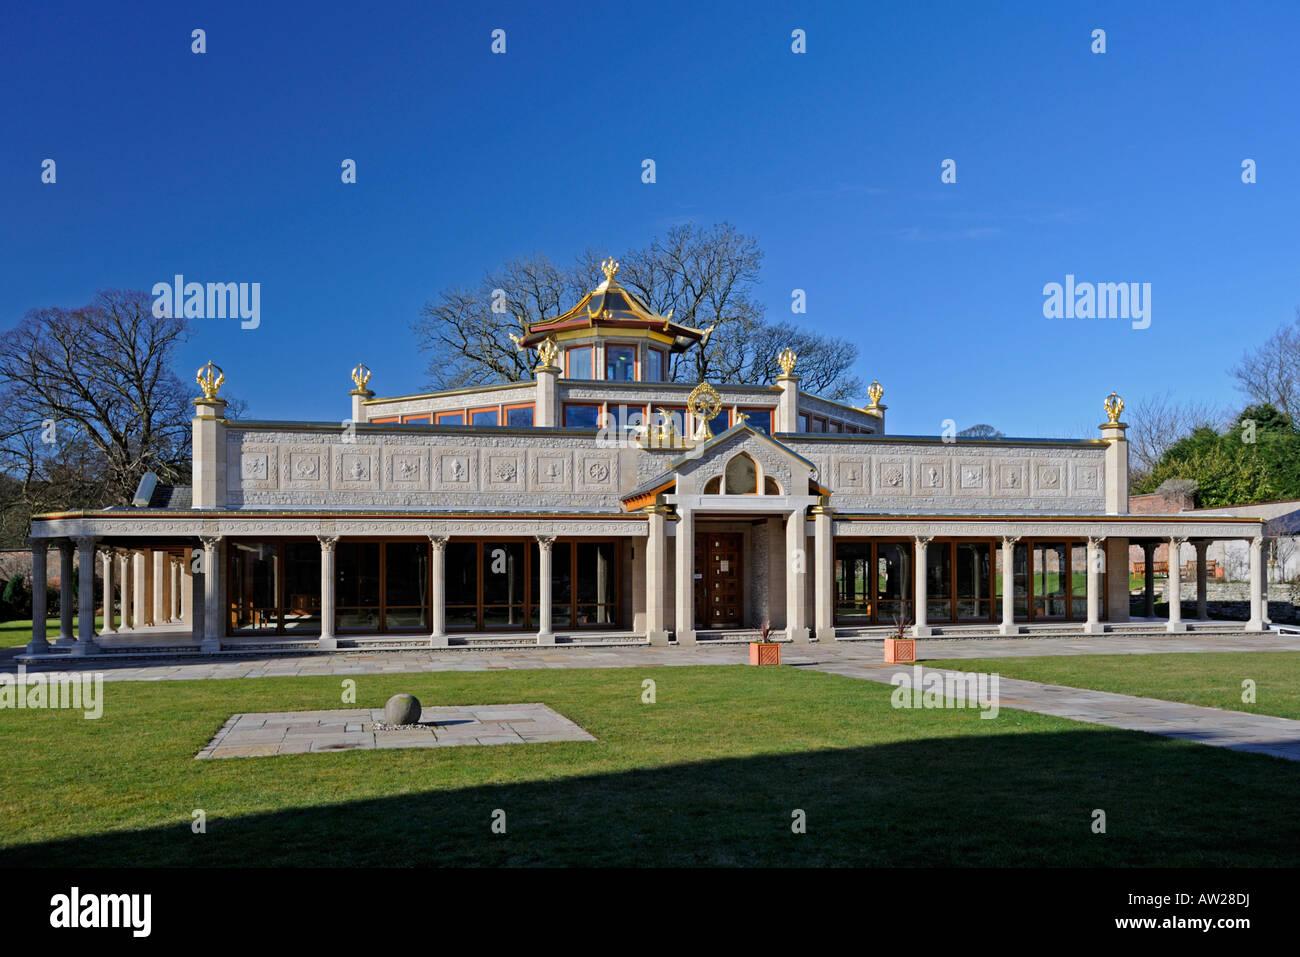 manjushri-kadampa-peace-temple-buddhism-meditation-centre-conishead-AW28DJ.jpg